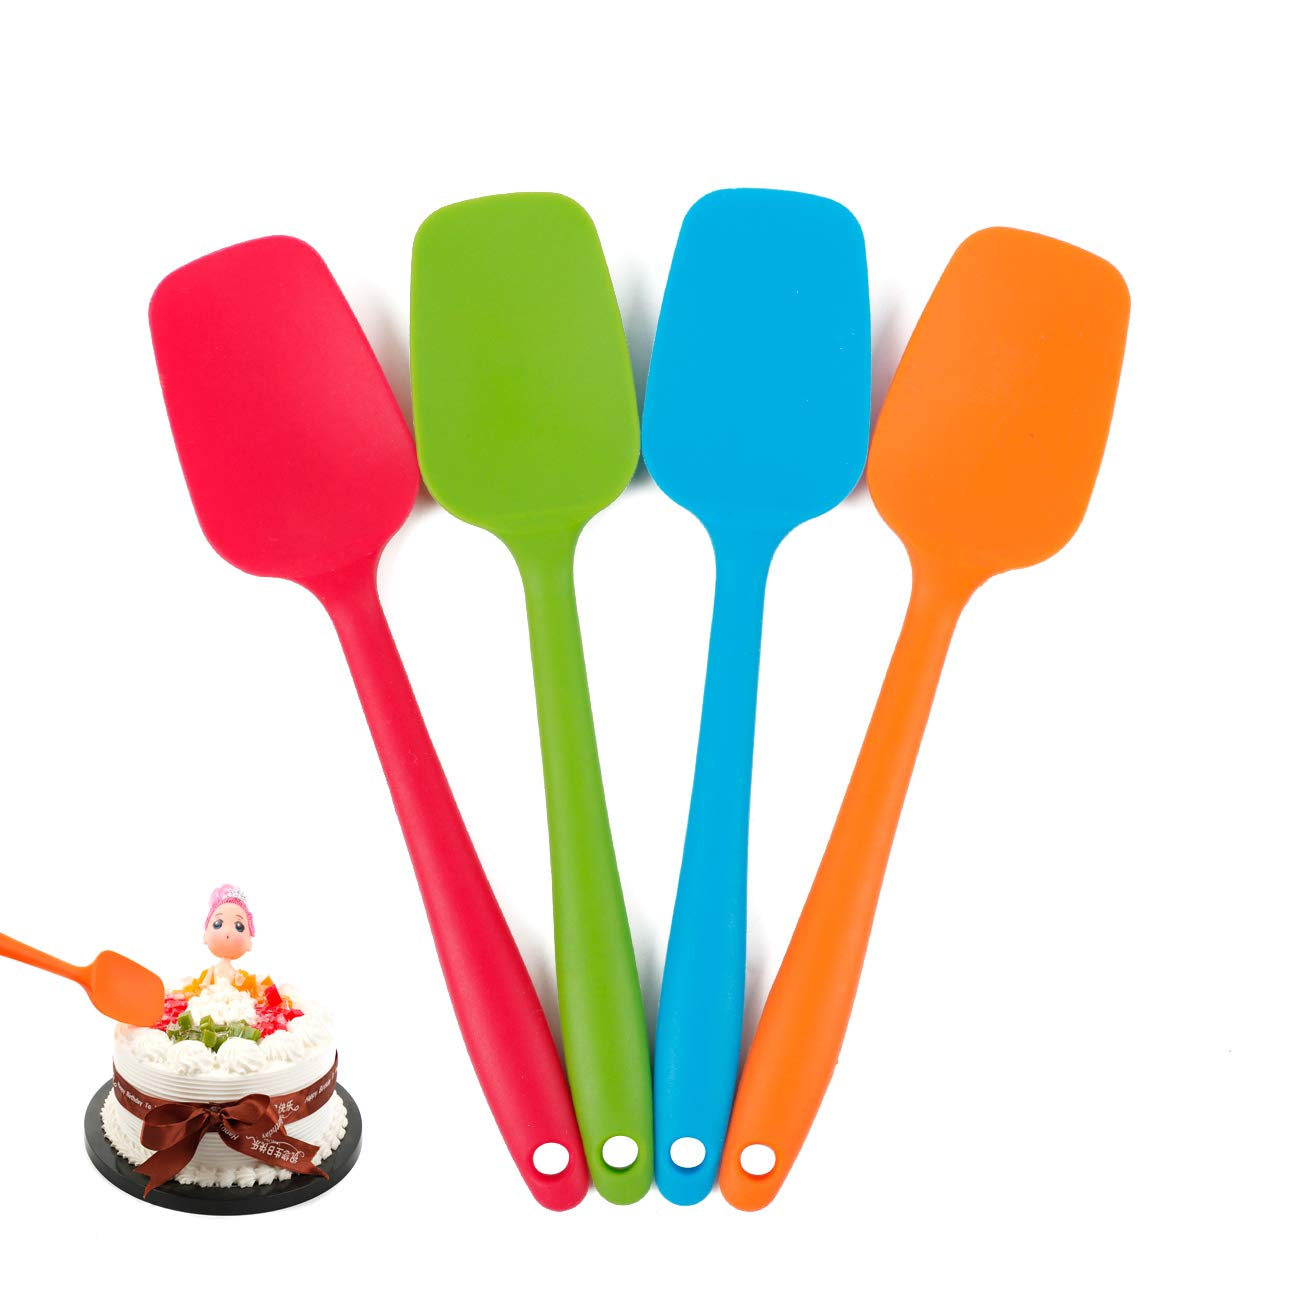 Delidge Silicone Spatula Set - 4-piece, Heat-Resistant Baking Spoon & Spatulas, Non-stick Rubber Dishwasher Safe Seamless Spatulas with Stainless Steel Core - Multicolor